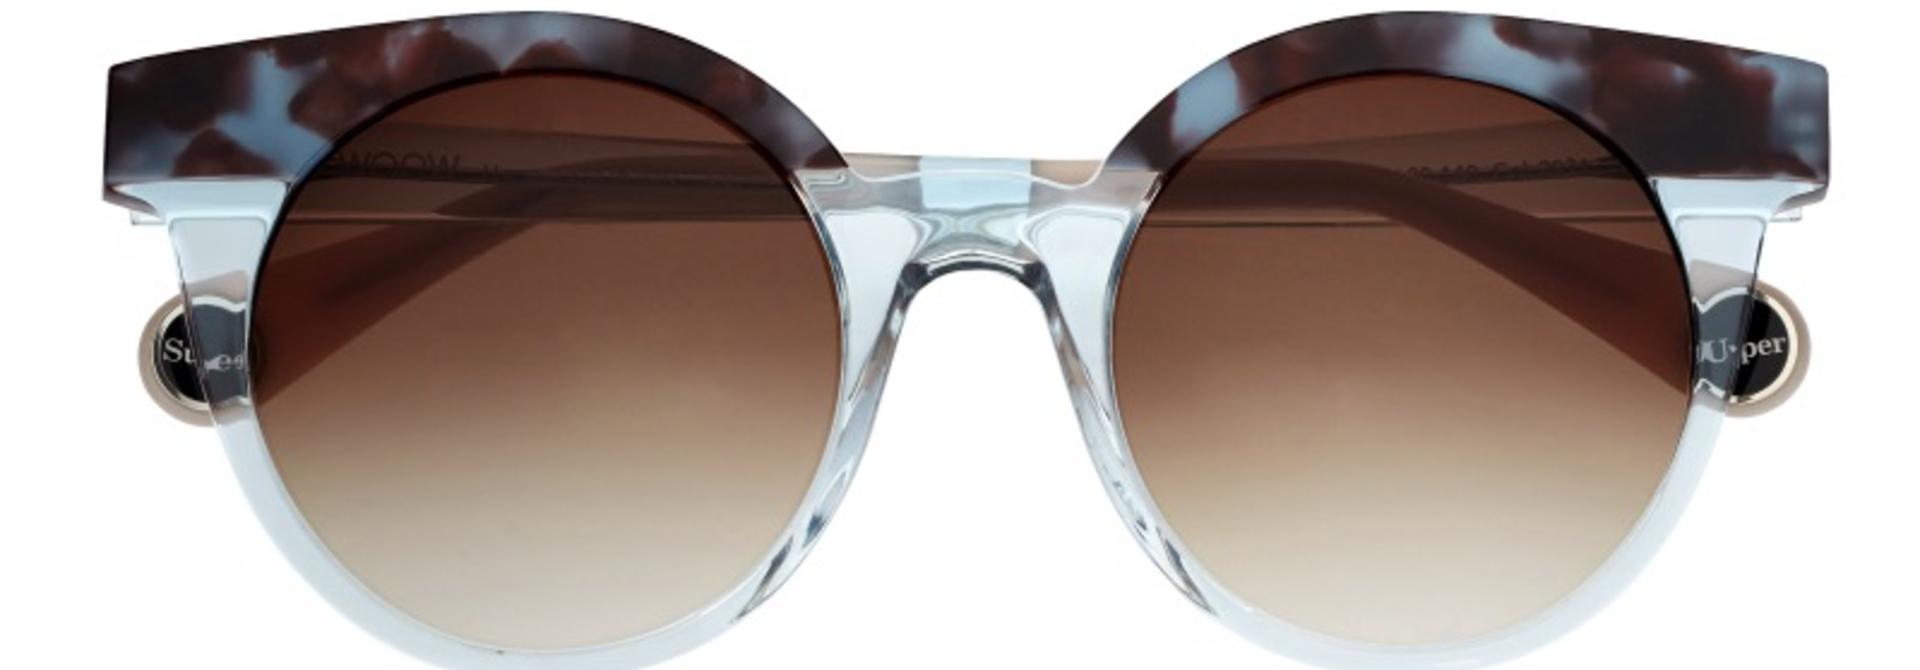 Super Upper 2 by Woow Eyewear